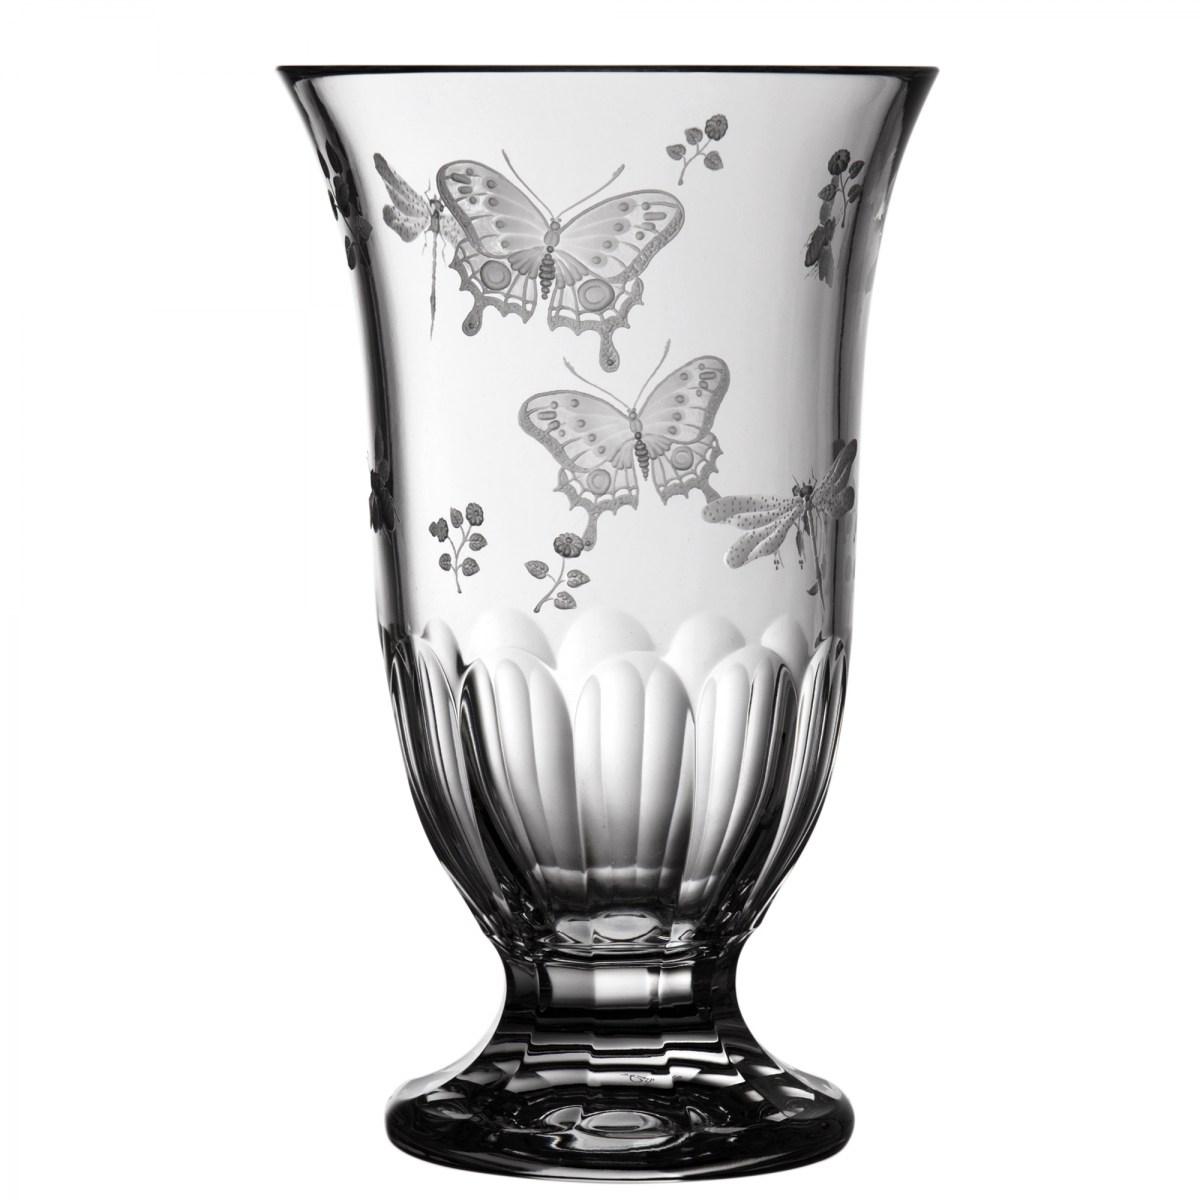 "Springtime Clear Footed Vase 10"" - $ 363 / € 318"